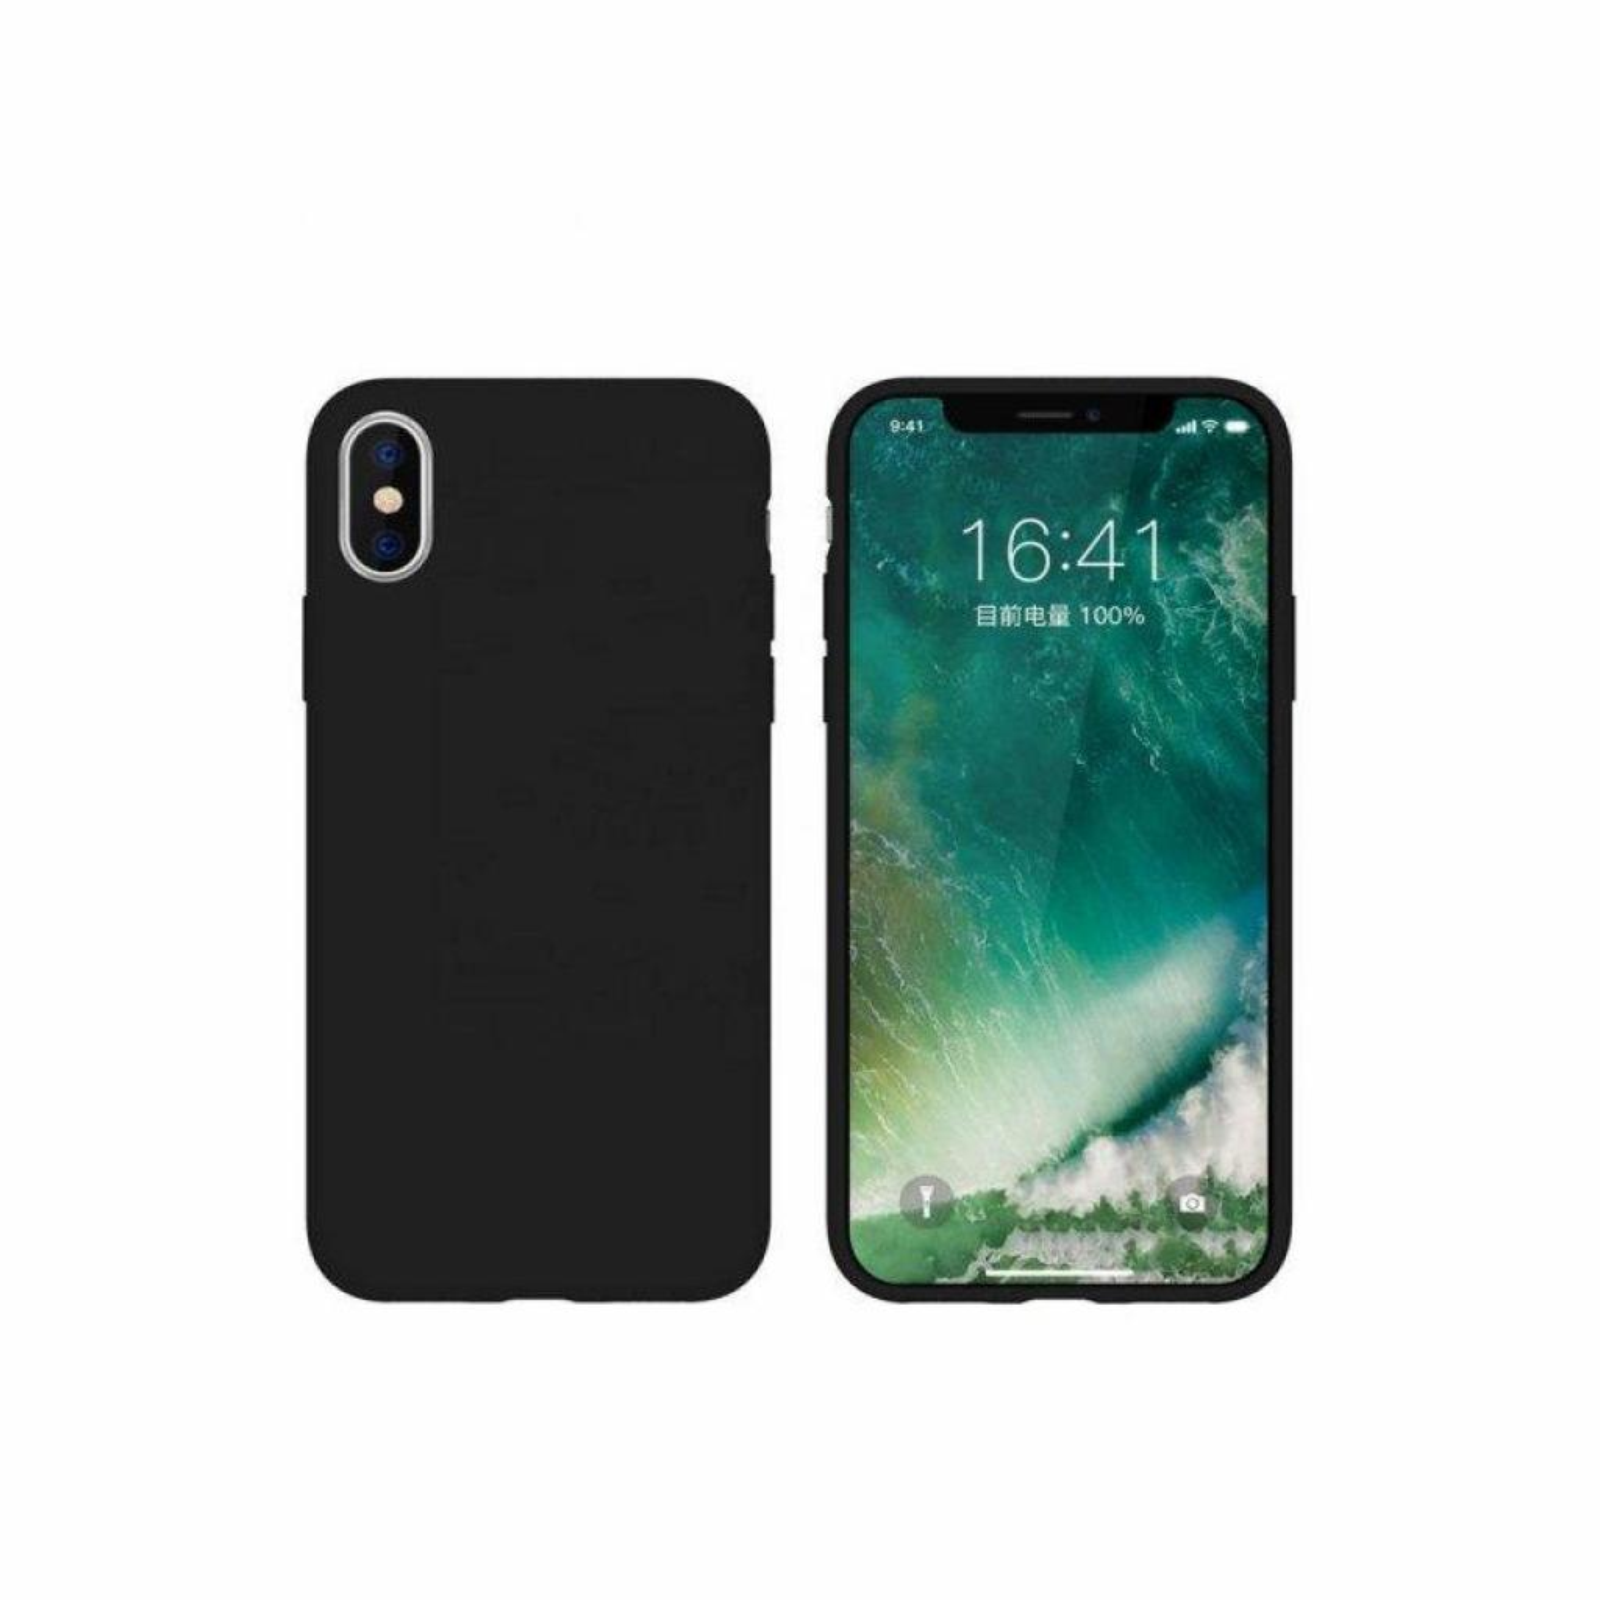 Чохол до моб. телефона 2E Basic Samsung Galaxy A41, Soft feeling, Black (2E-G-A41-NKSF-BK)